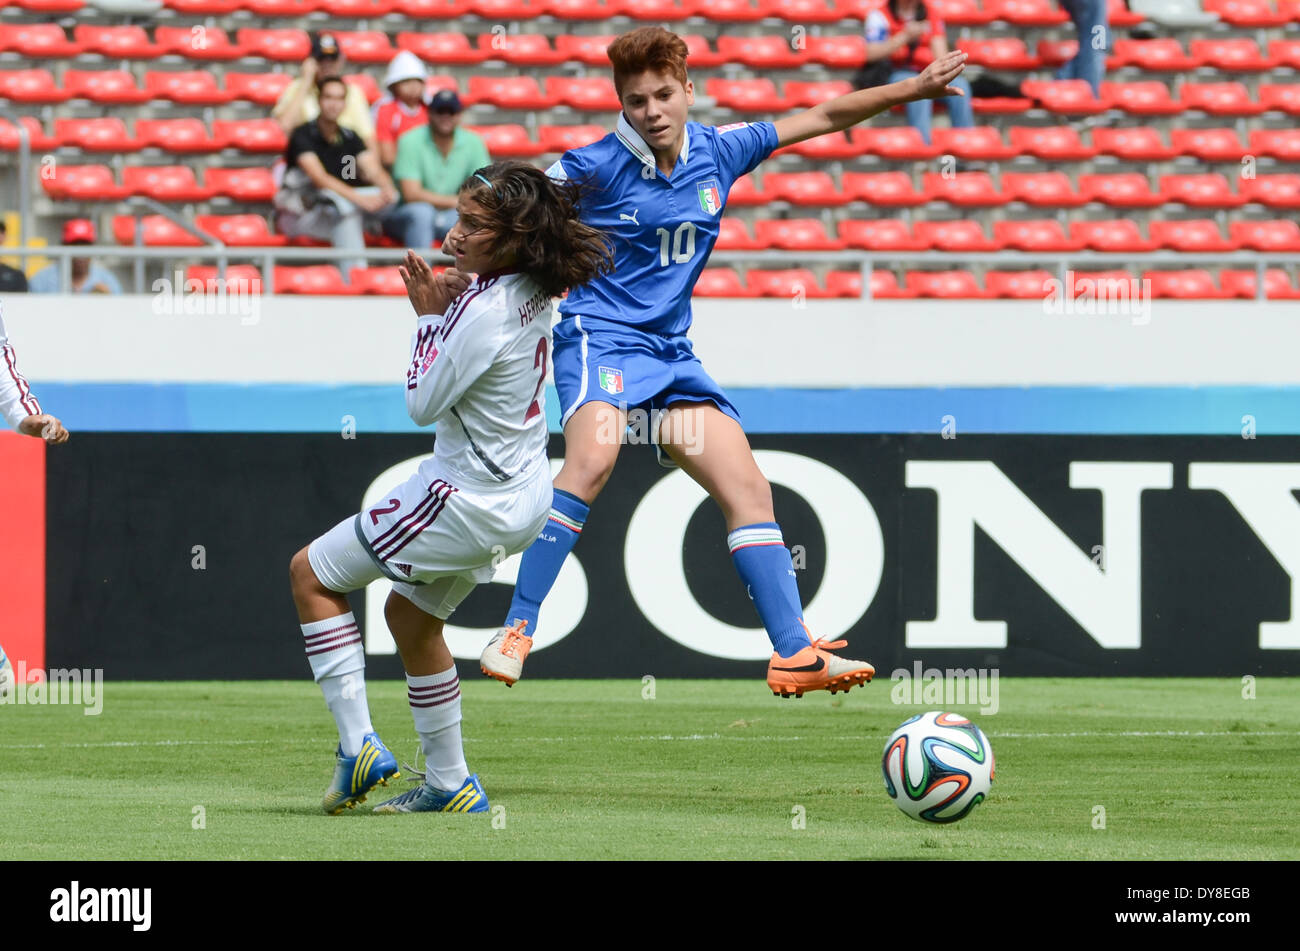 Italy player Manuela GIUGLIANO (10), shots against Venezuela player Veronica HERRERA (2). - Stock Image